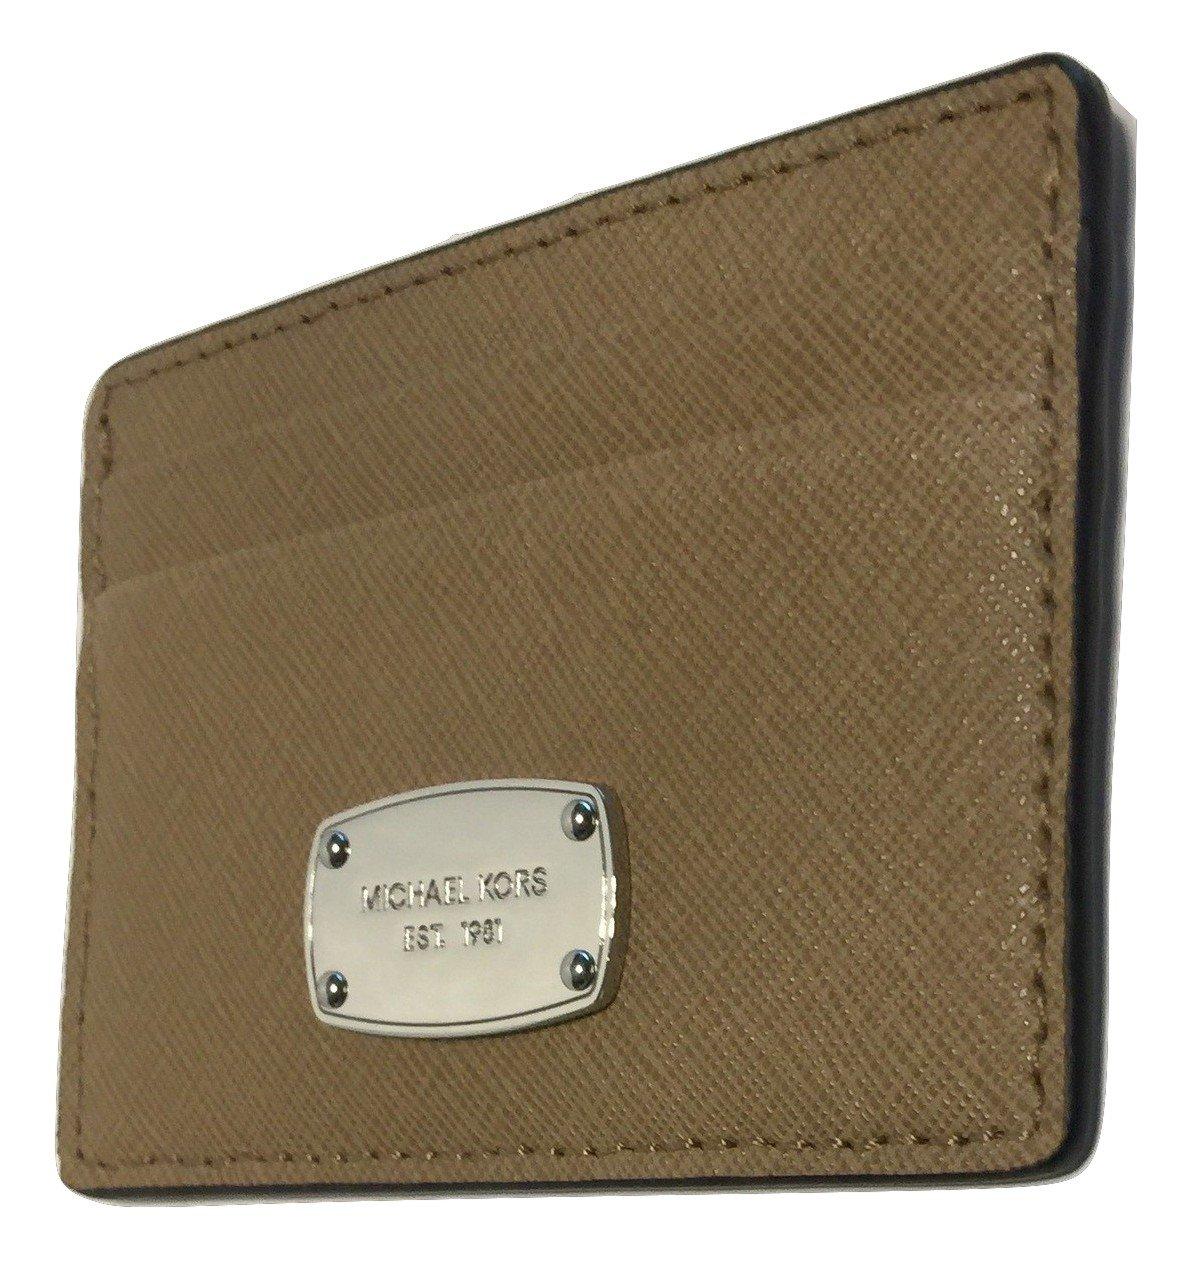 Michael Kors Jet Set Travel Credit Card Holder Case Saffiano Leather (DK Khaki)